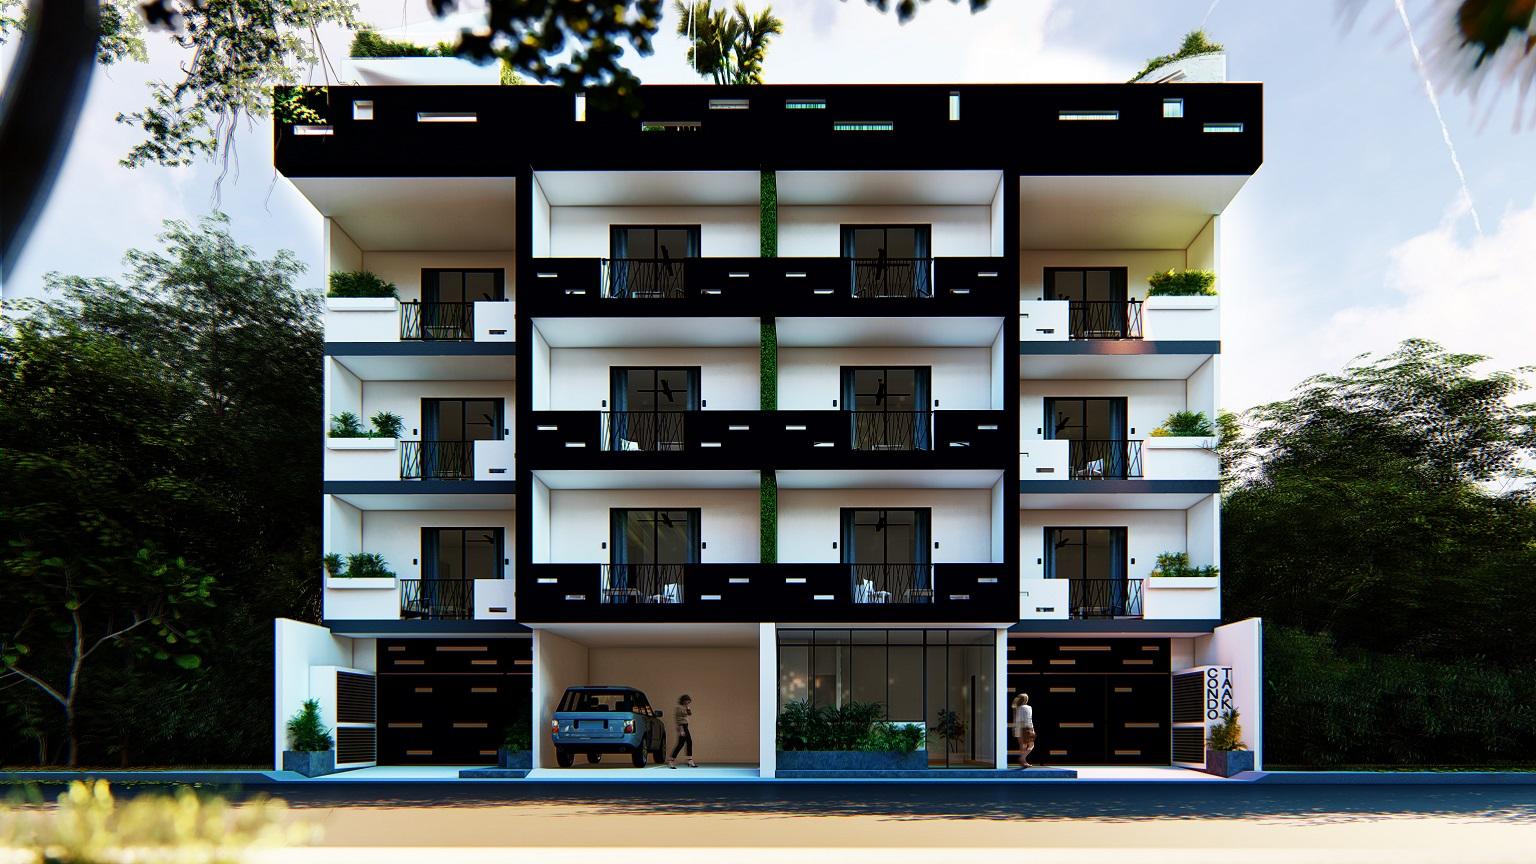 21505 Stunning 1 bedroom condo near Centro  - Condo